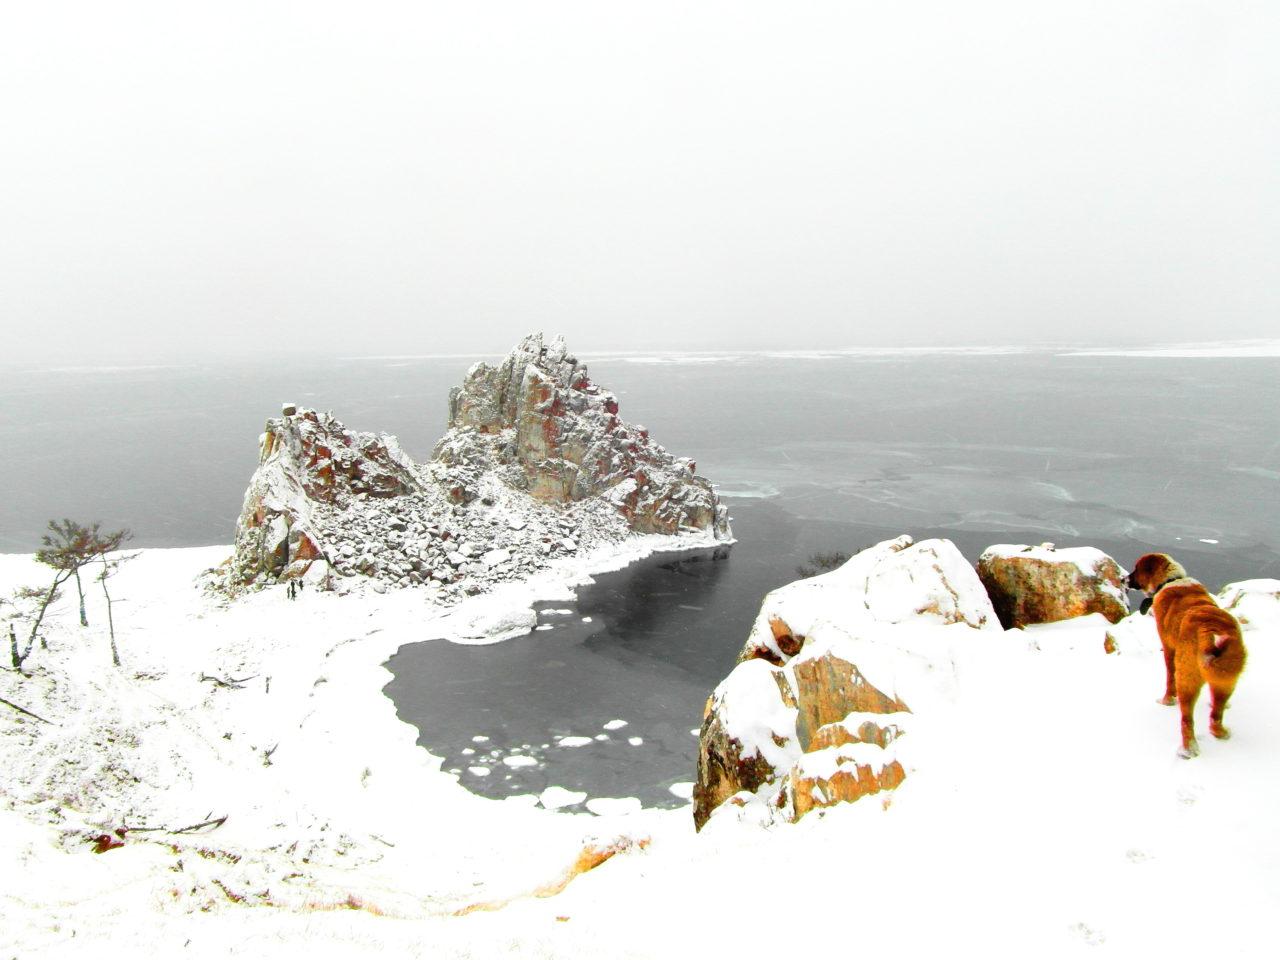 Schamanenfelsen auf der Baikal-Insel Olchon im Winter / Peggy Lohse